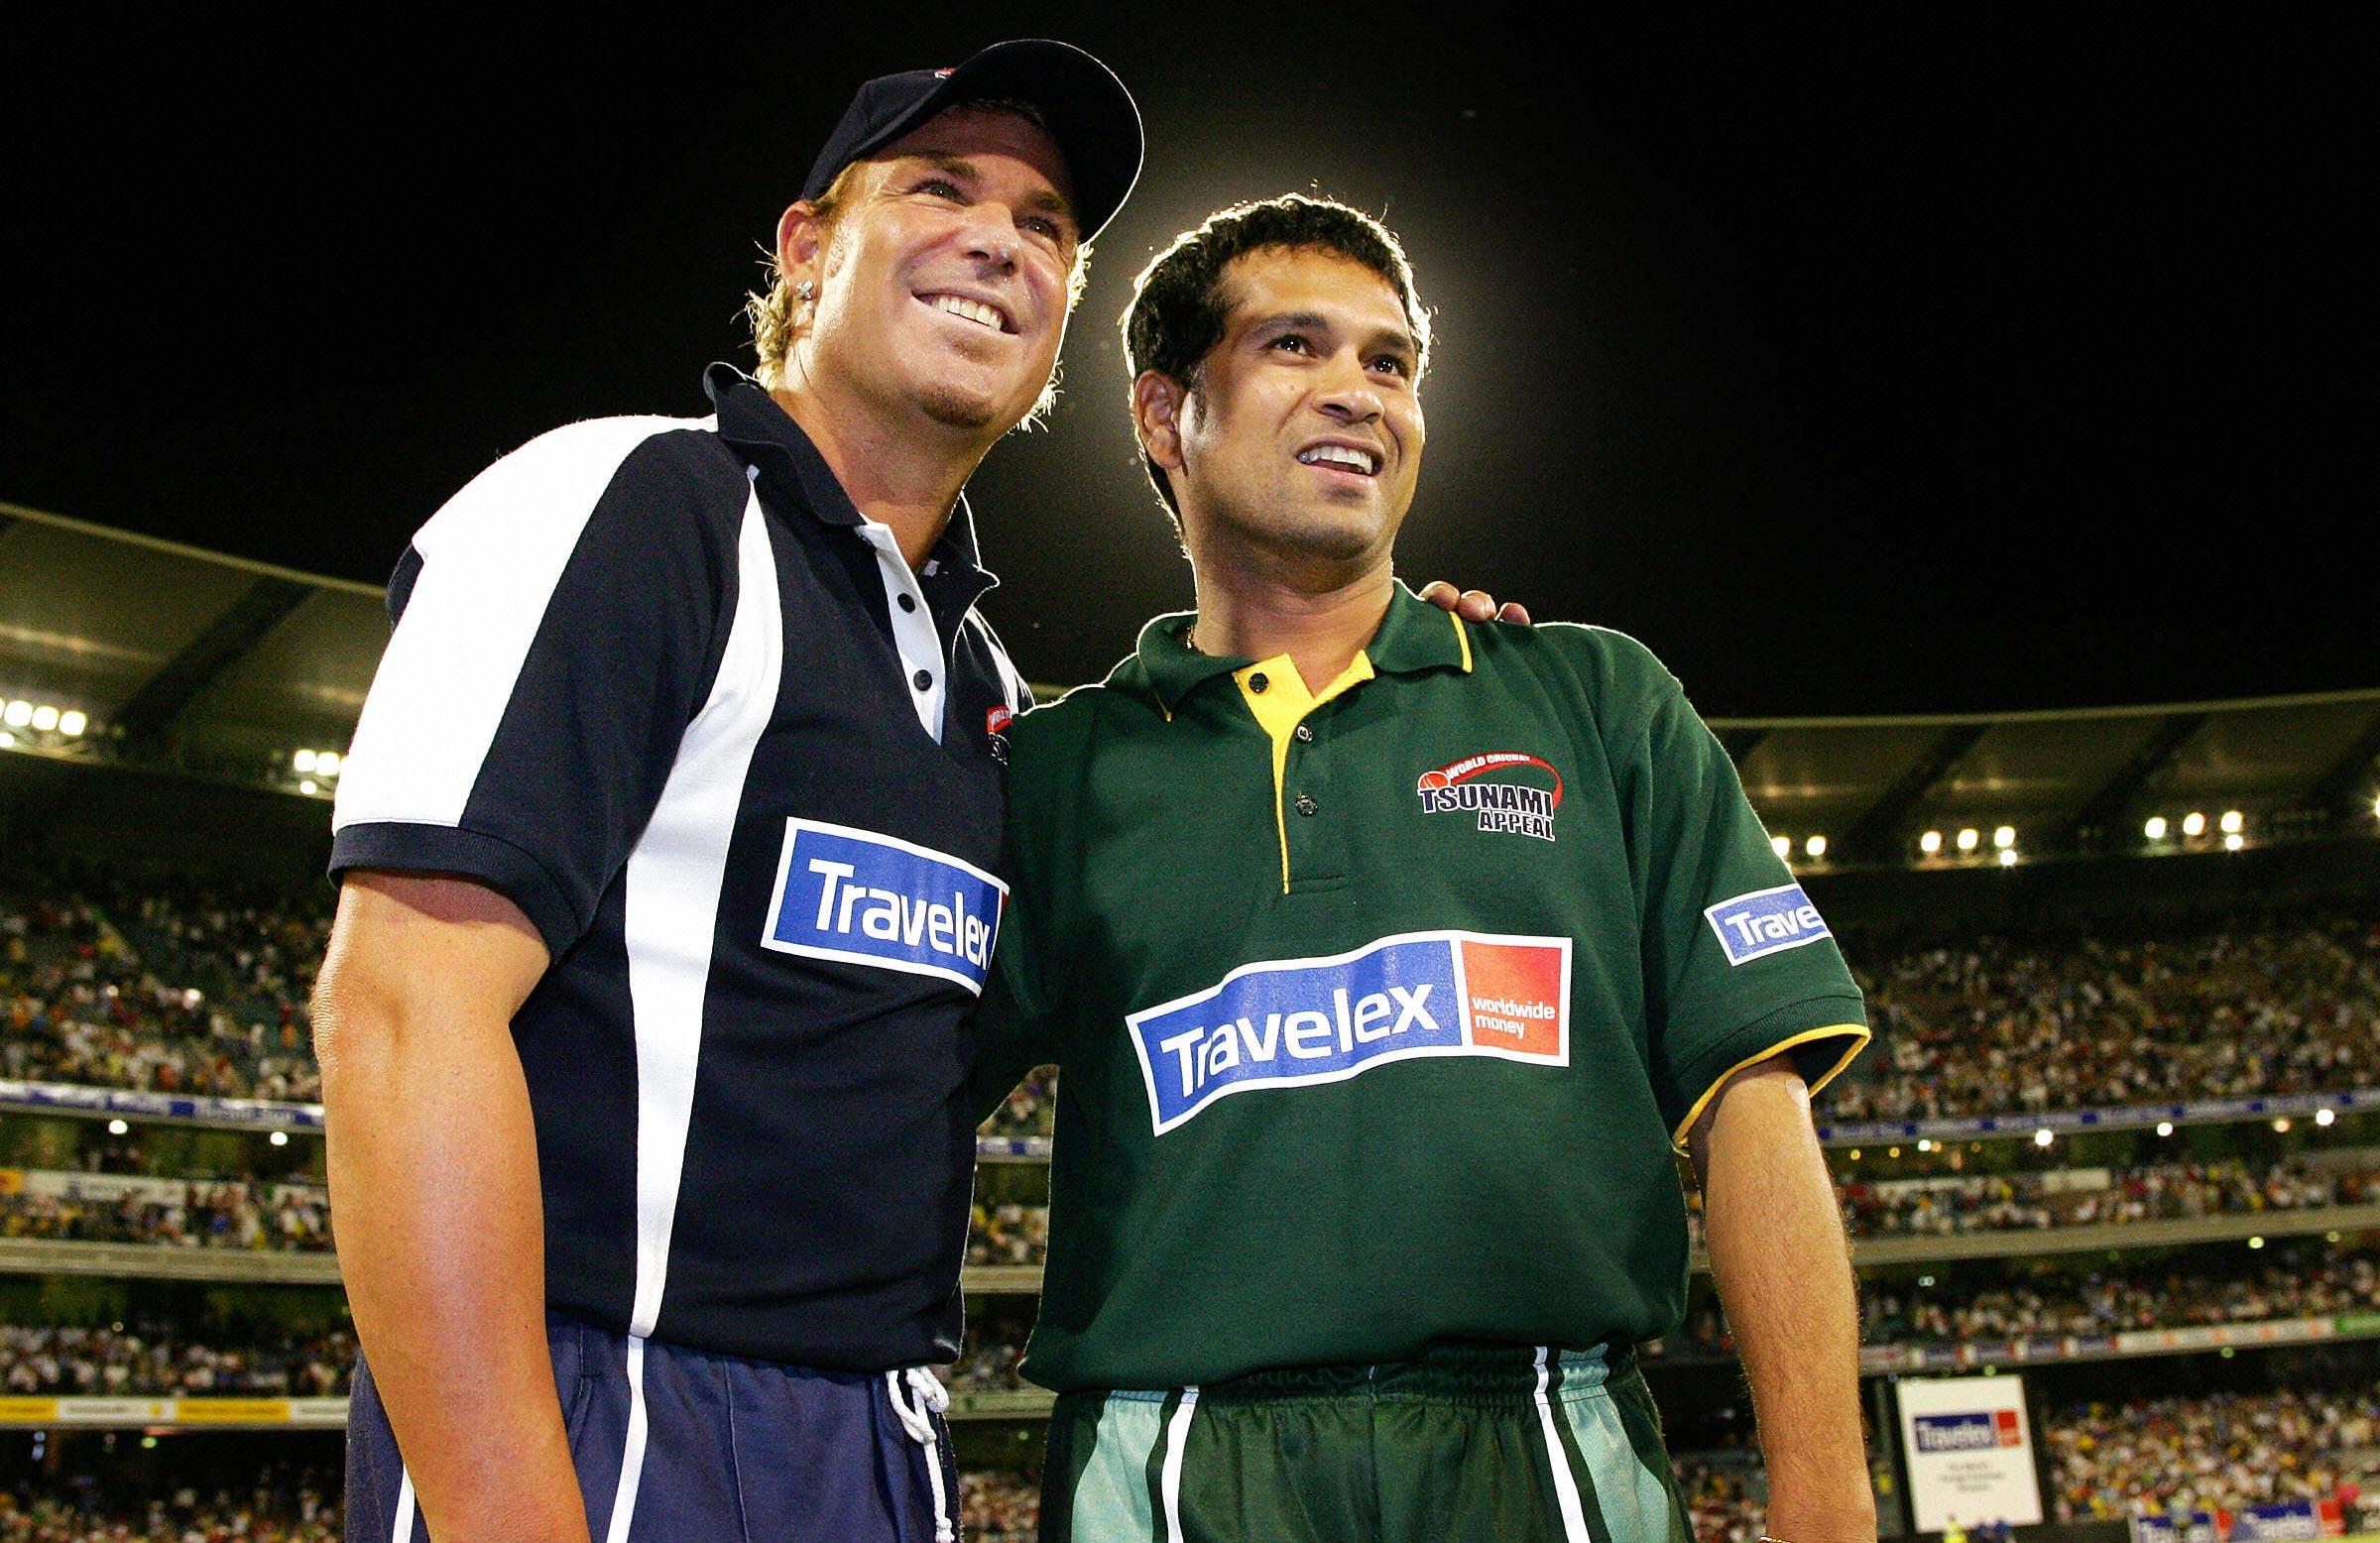 Warne and Tendulkar at a charity match after the 2004 tsunami // Getty